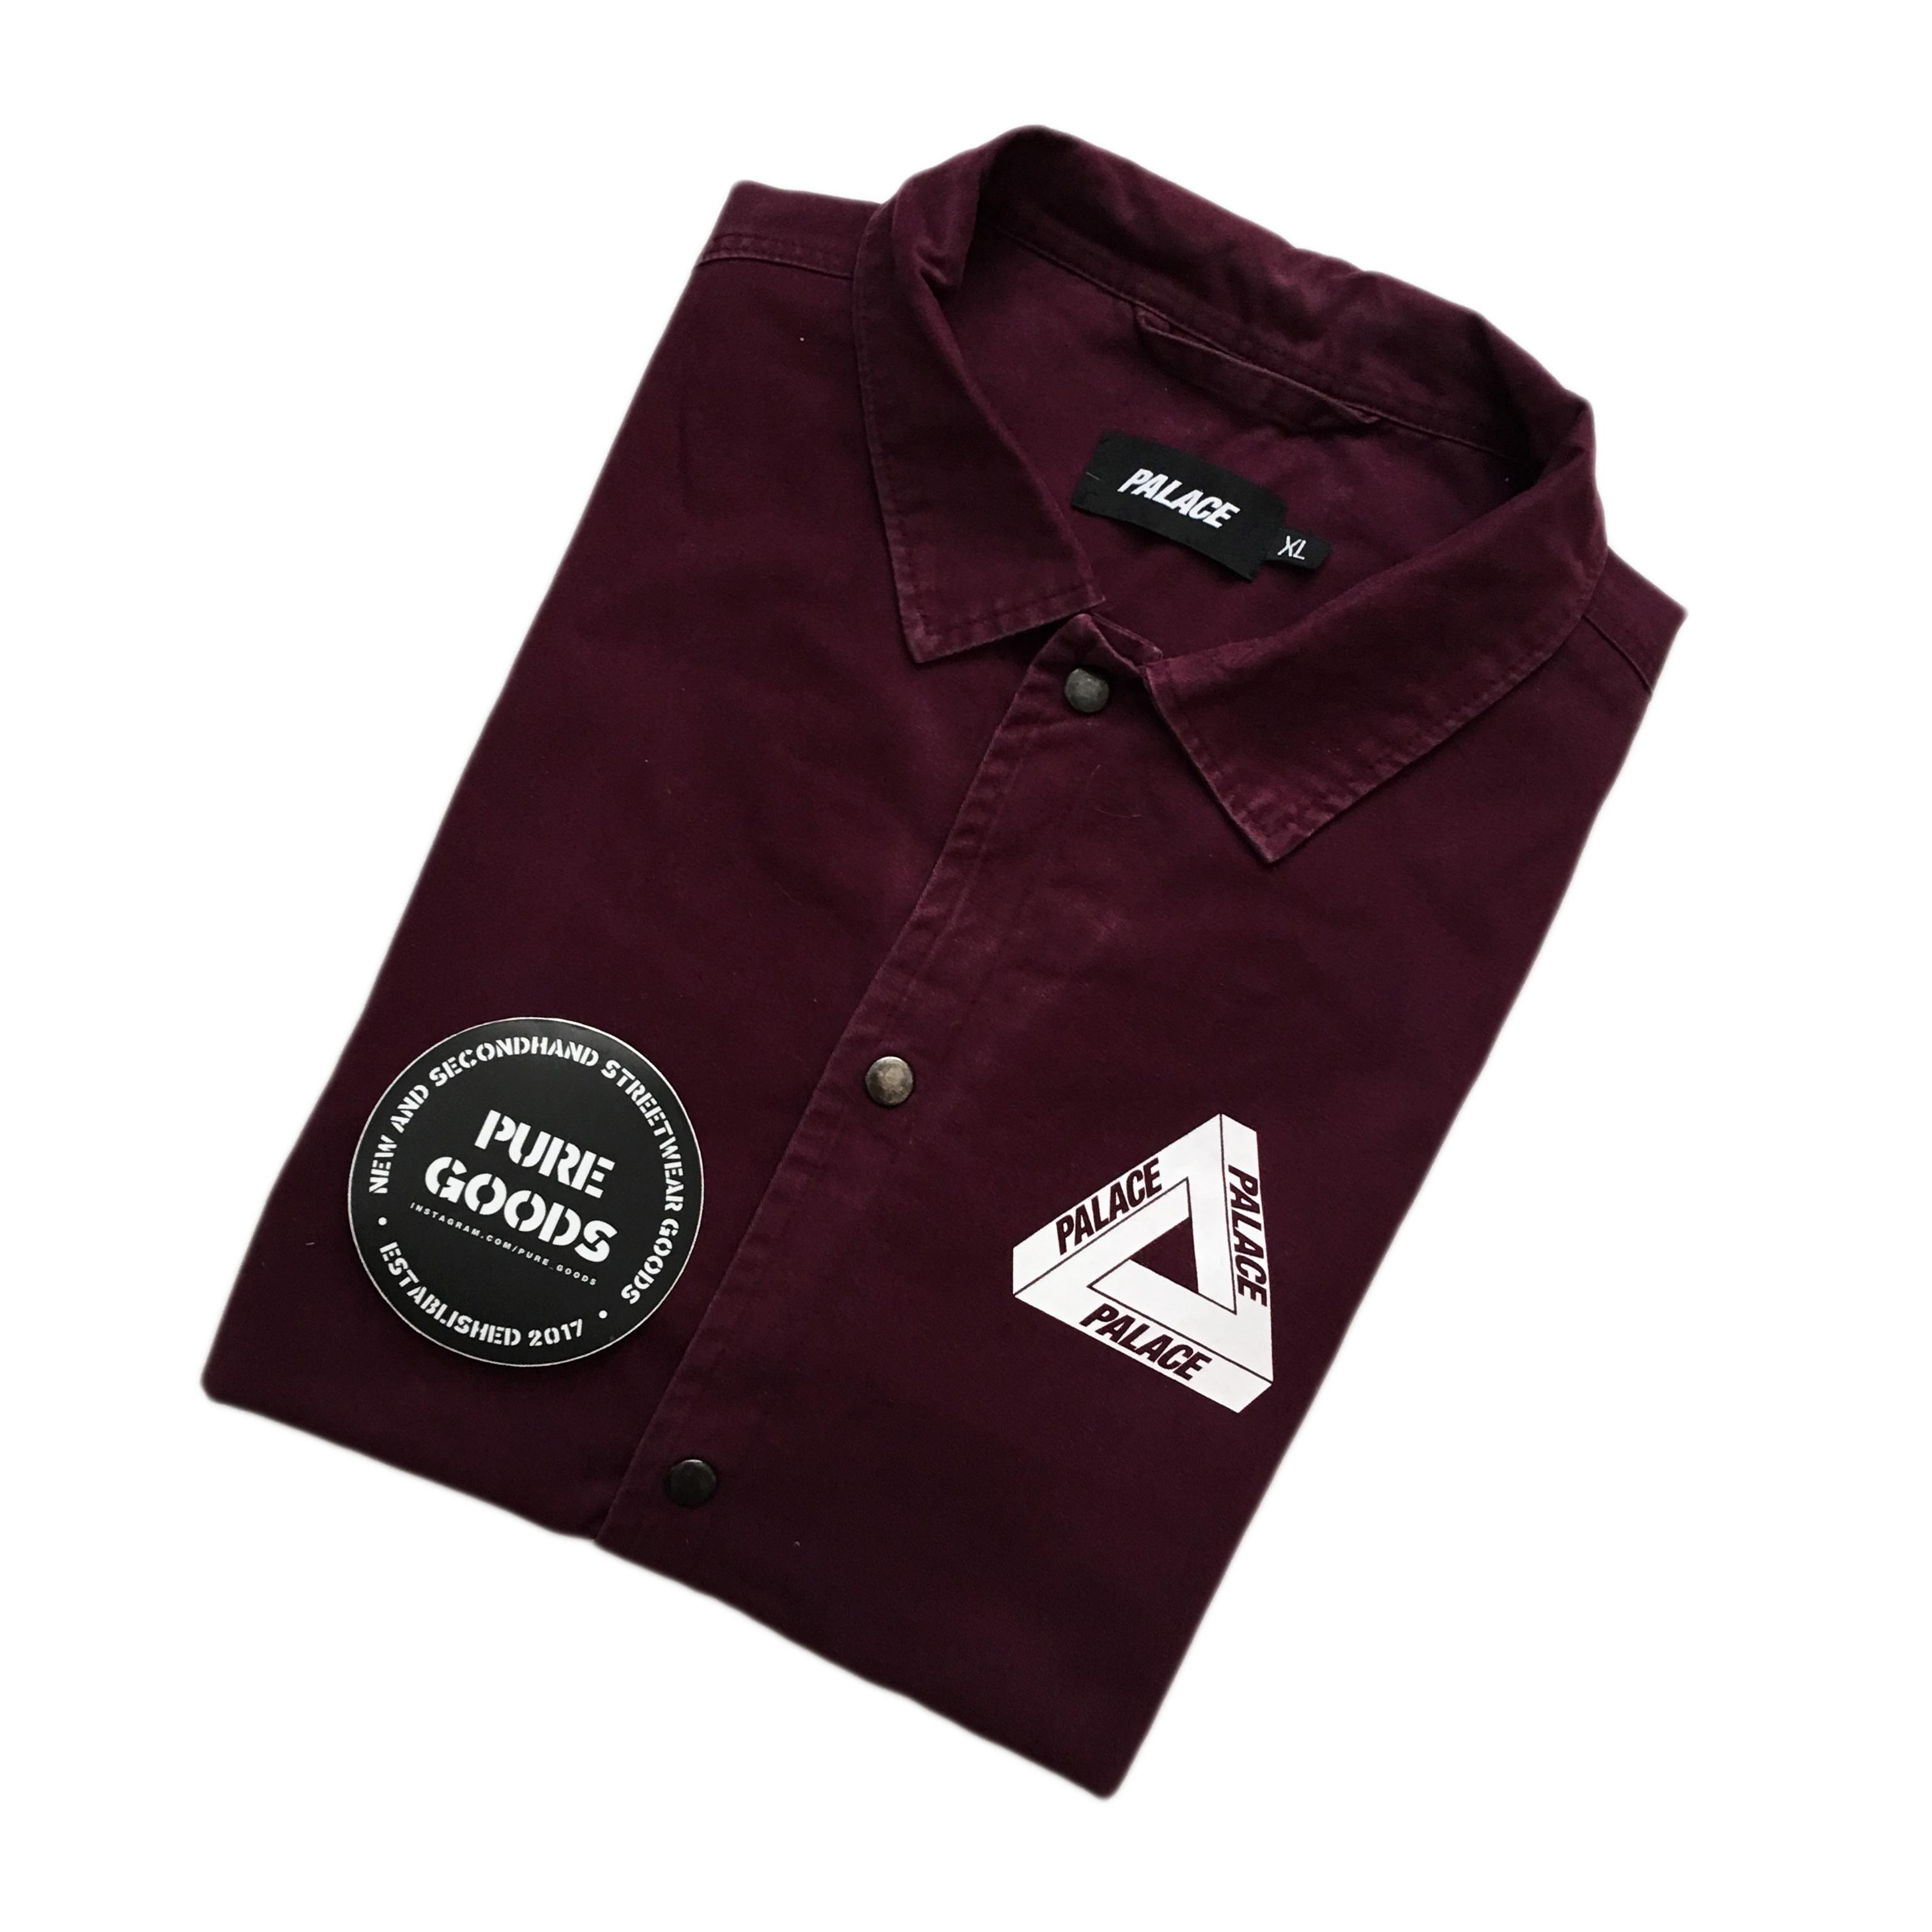 2bb99dd95c8c Palace OG Tri-Ferg coach jacket Size xl - Light Jackets for Sale - Grailed